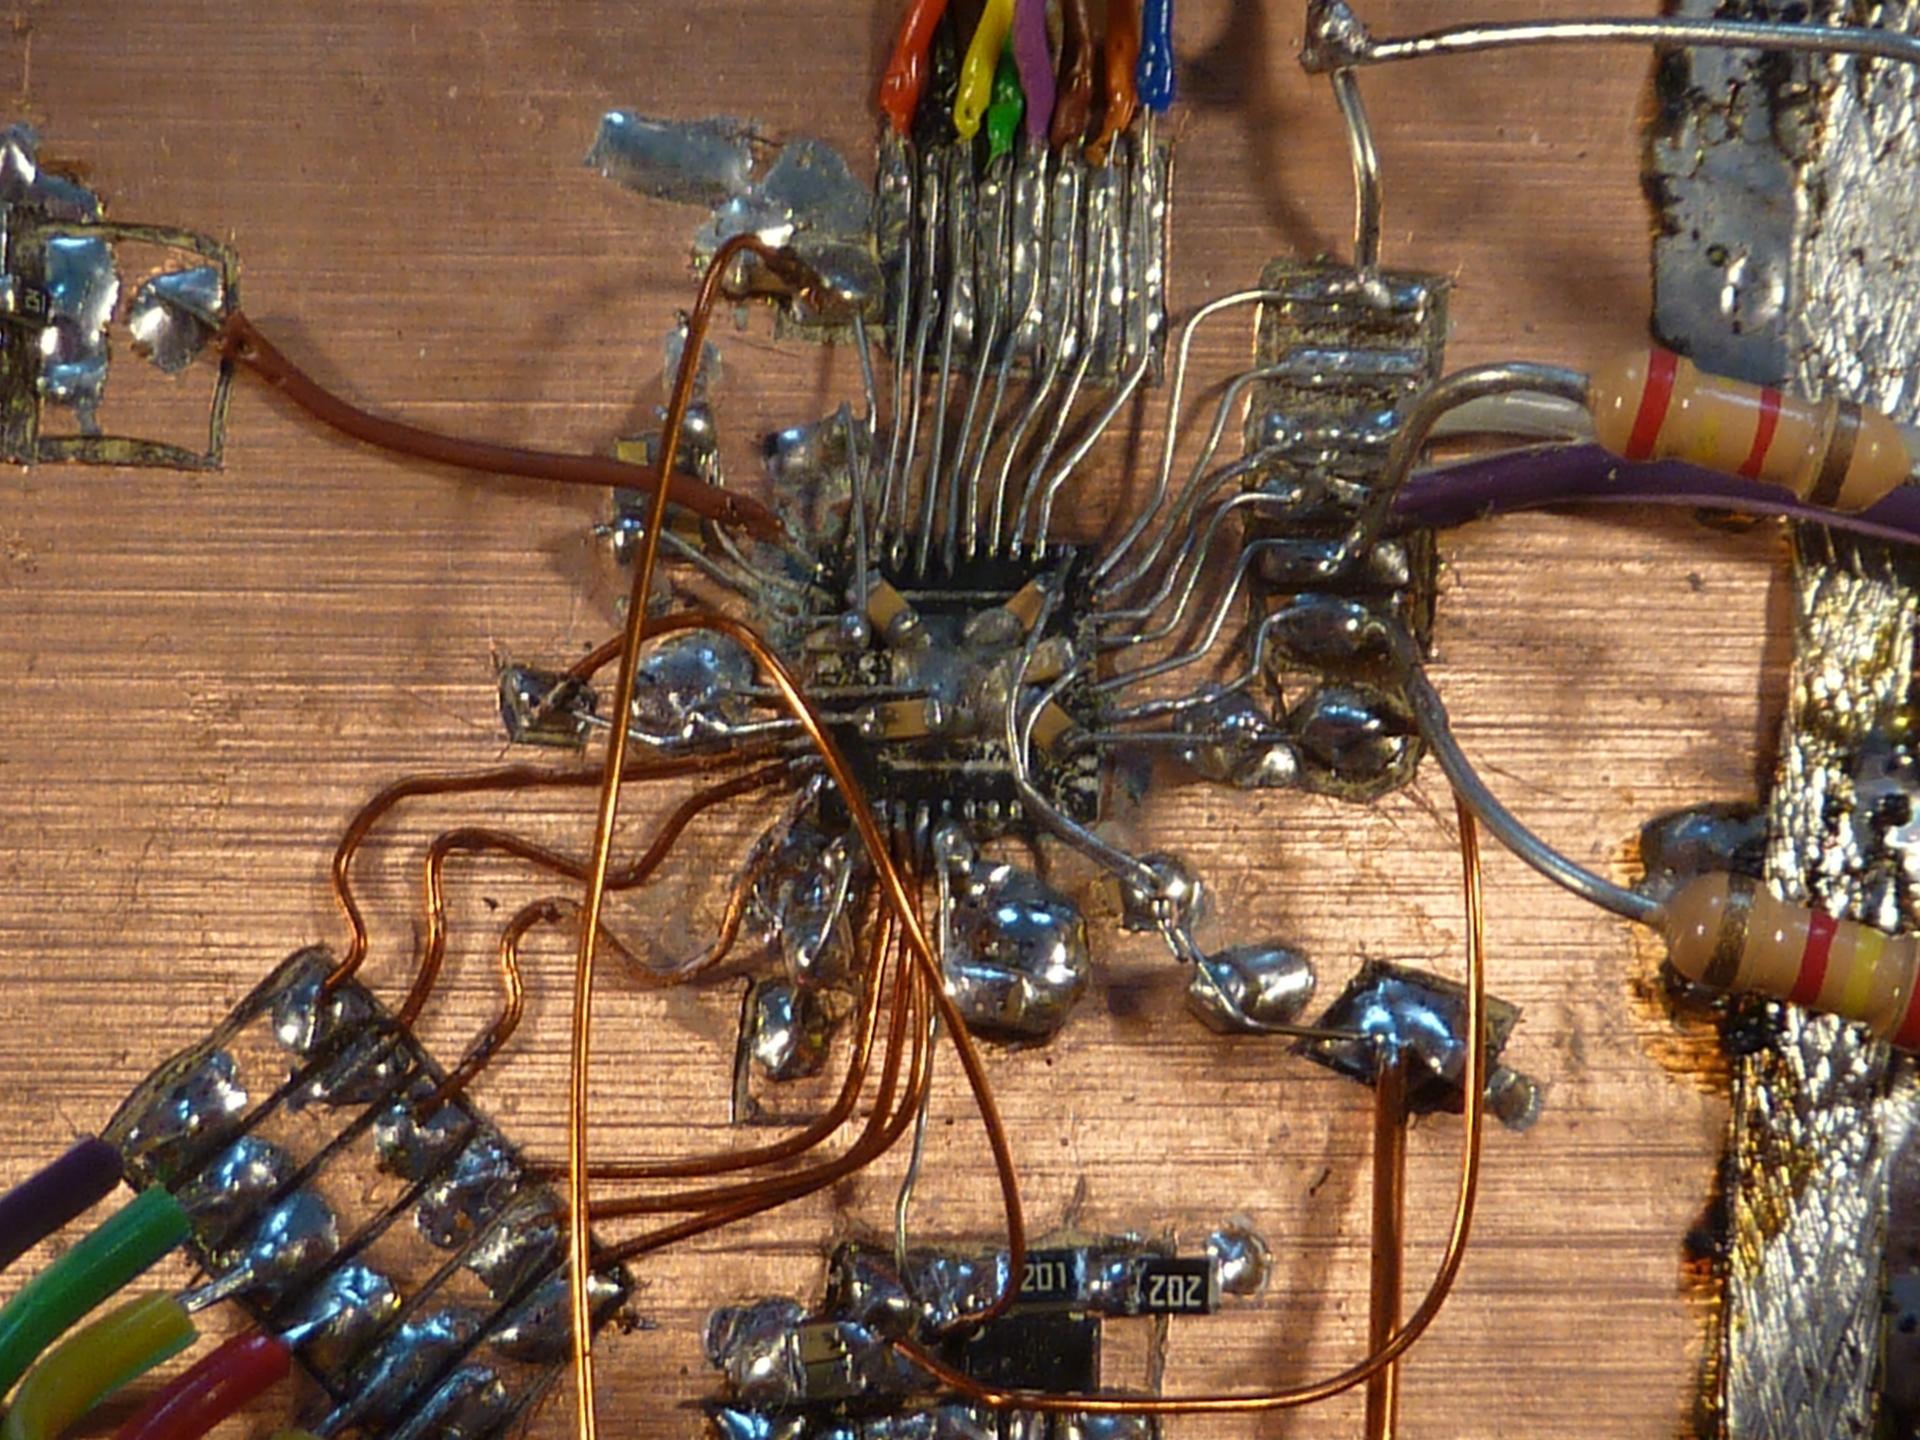 Deadbugged gigabit PHY used for testing the FPGA firmware